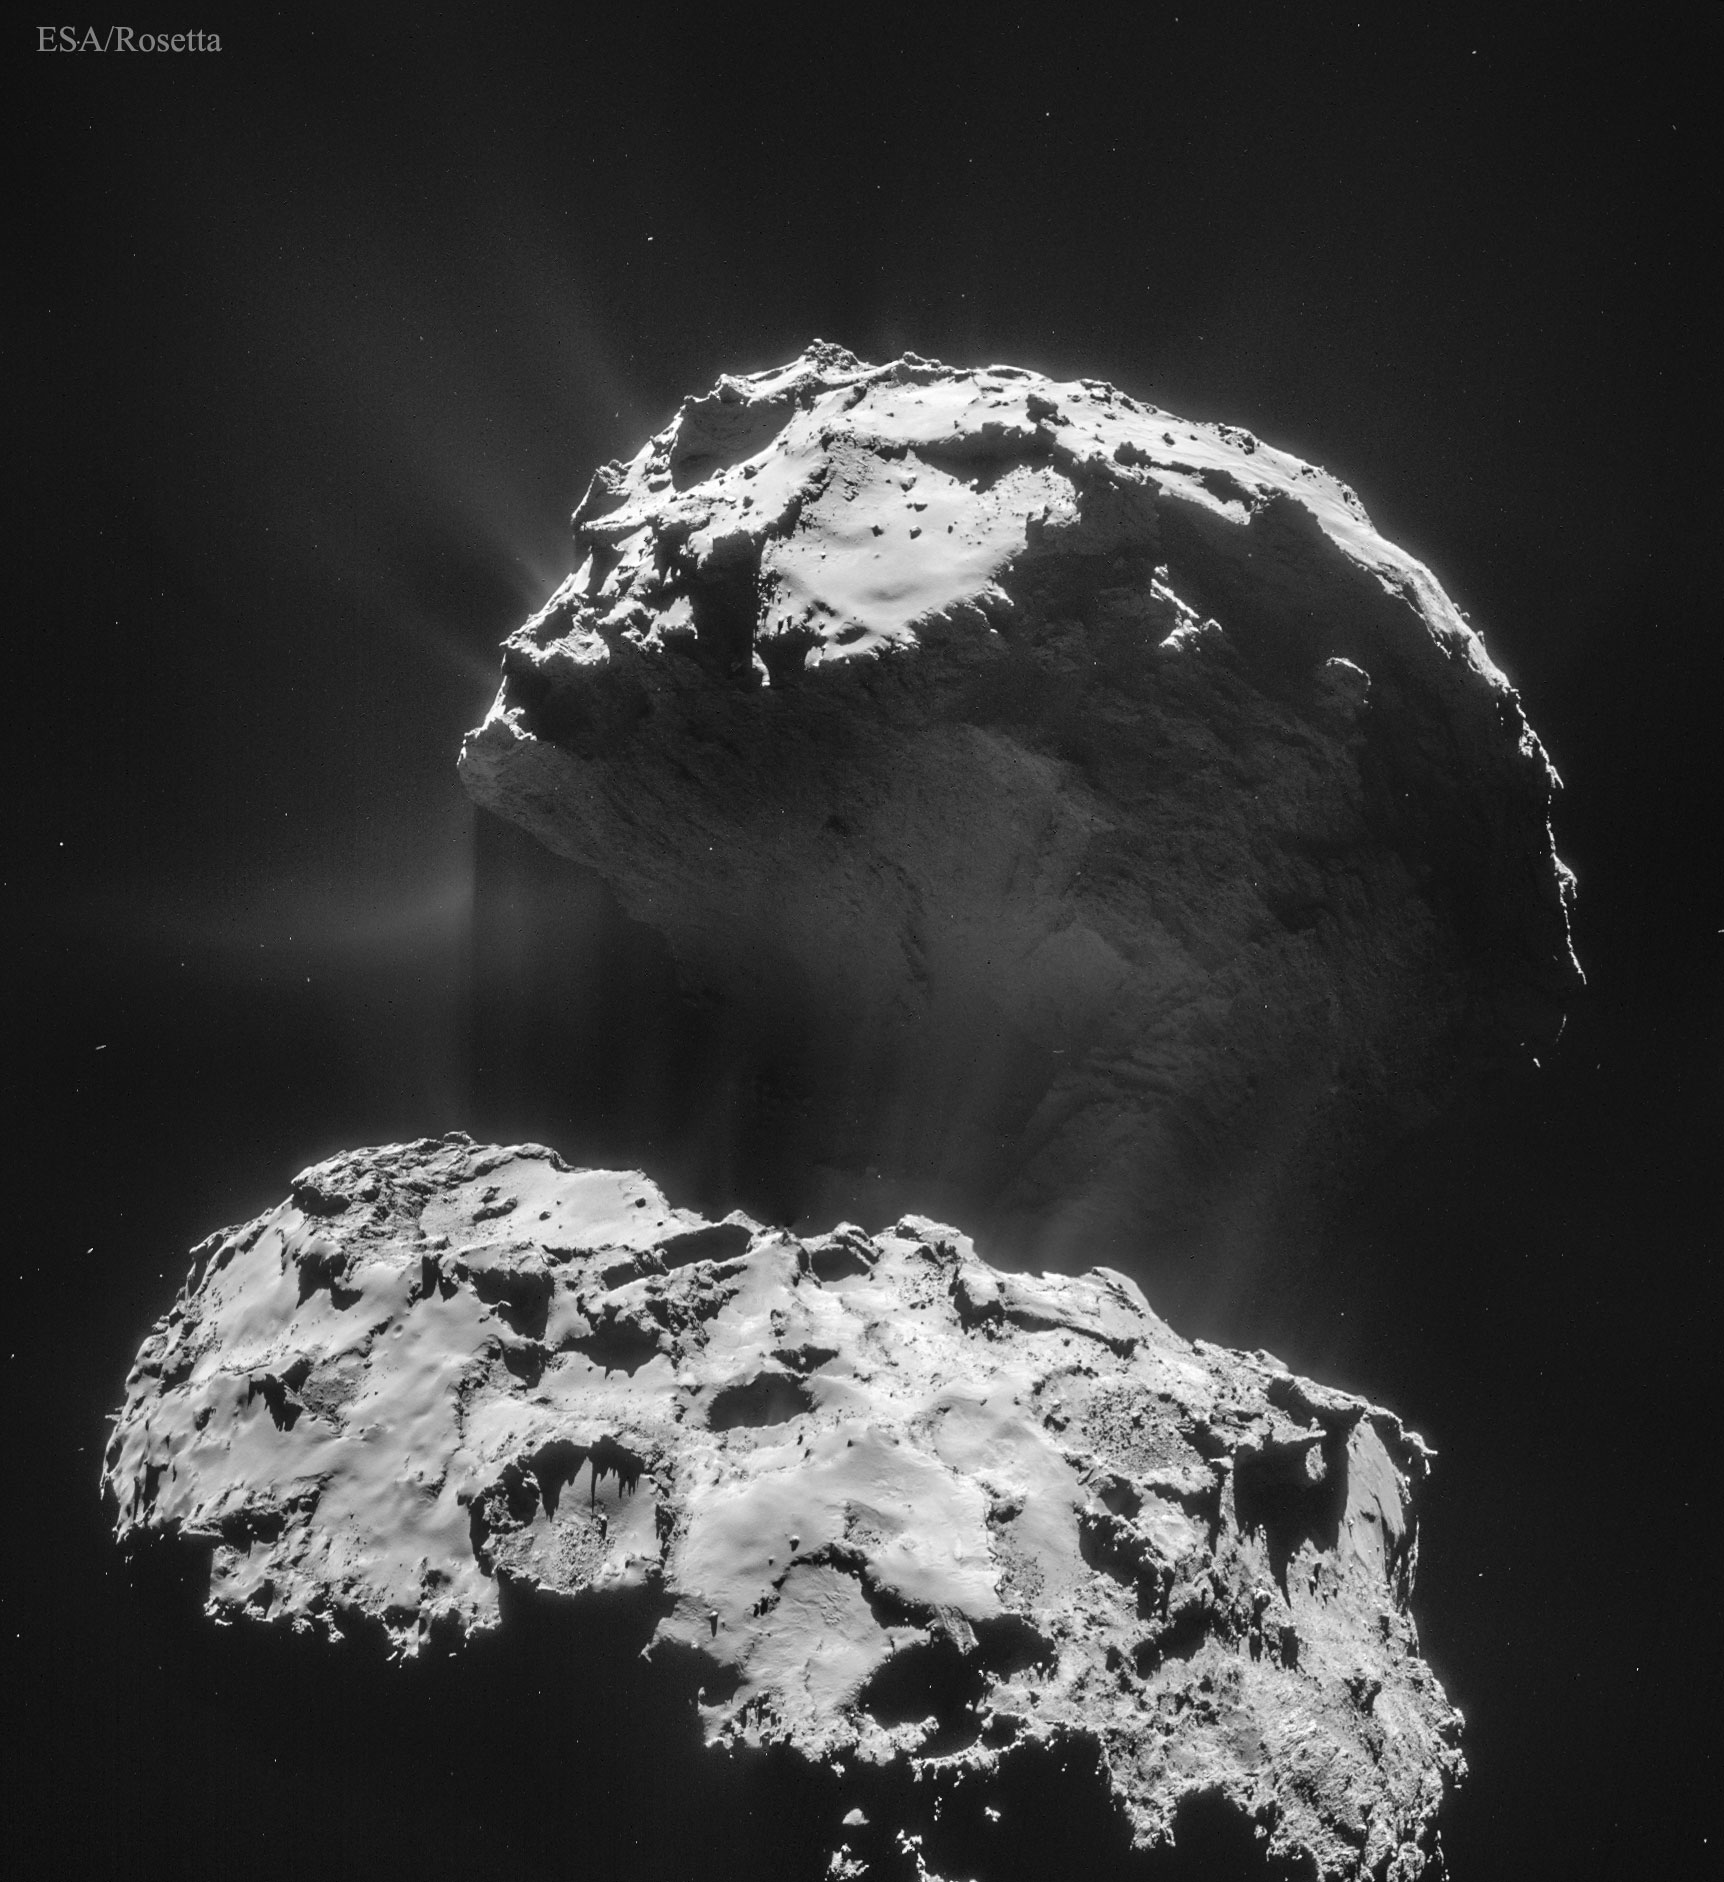 Comet 67P as seen from spacecraft Rosetta [APOD ...